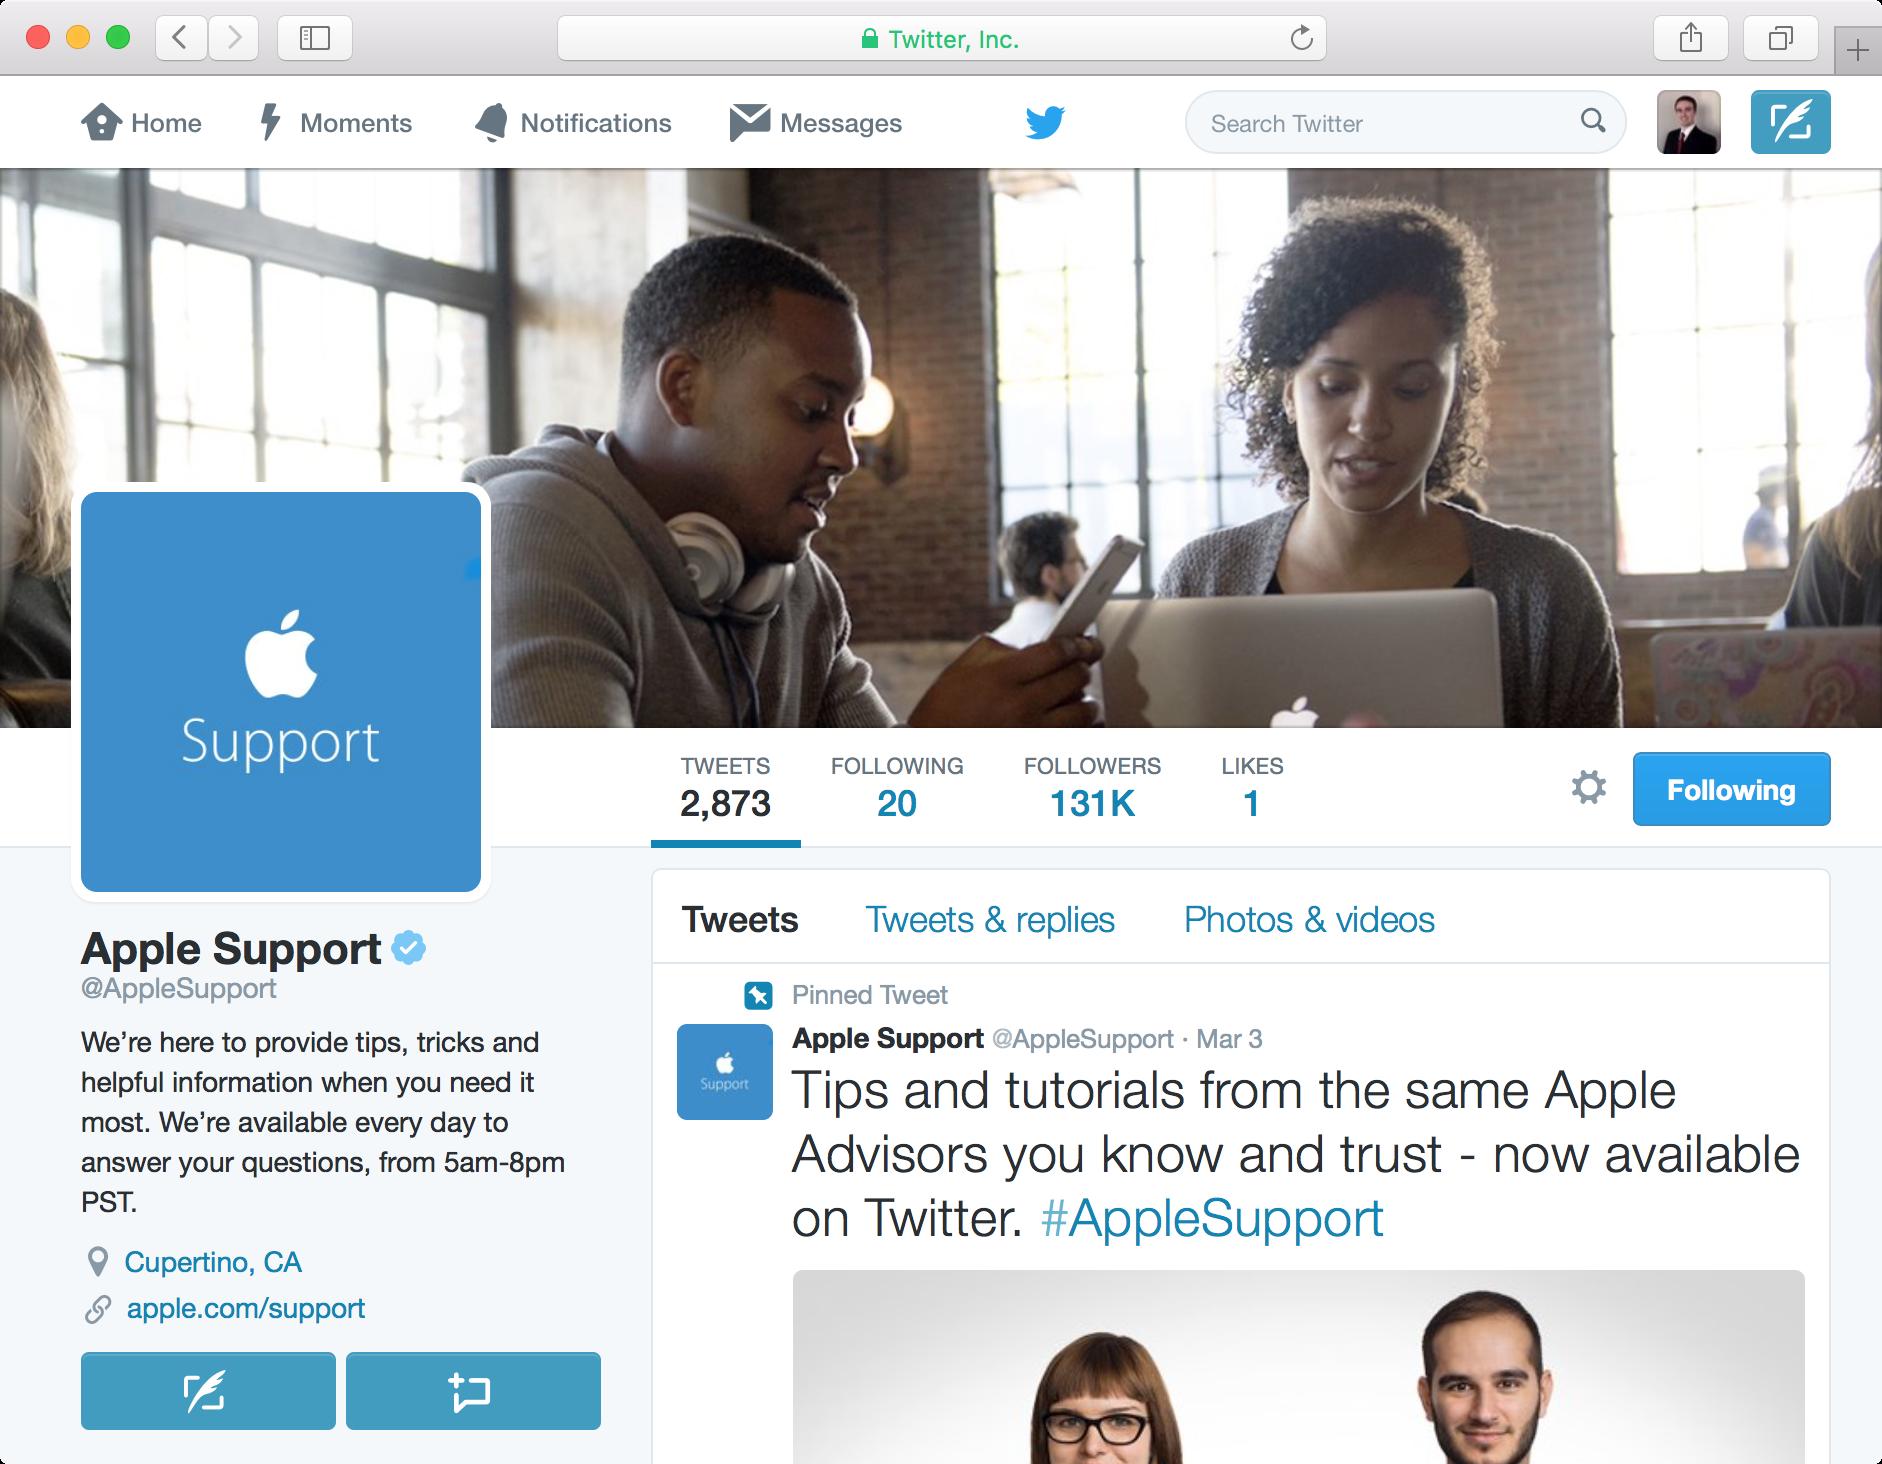 Apple Support Twitter in Safari